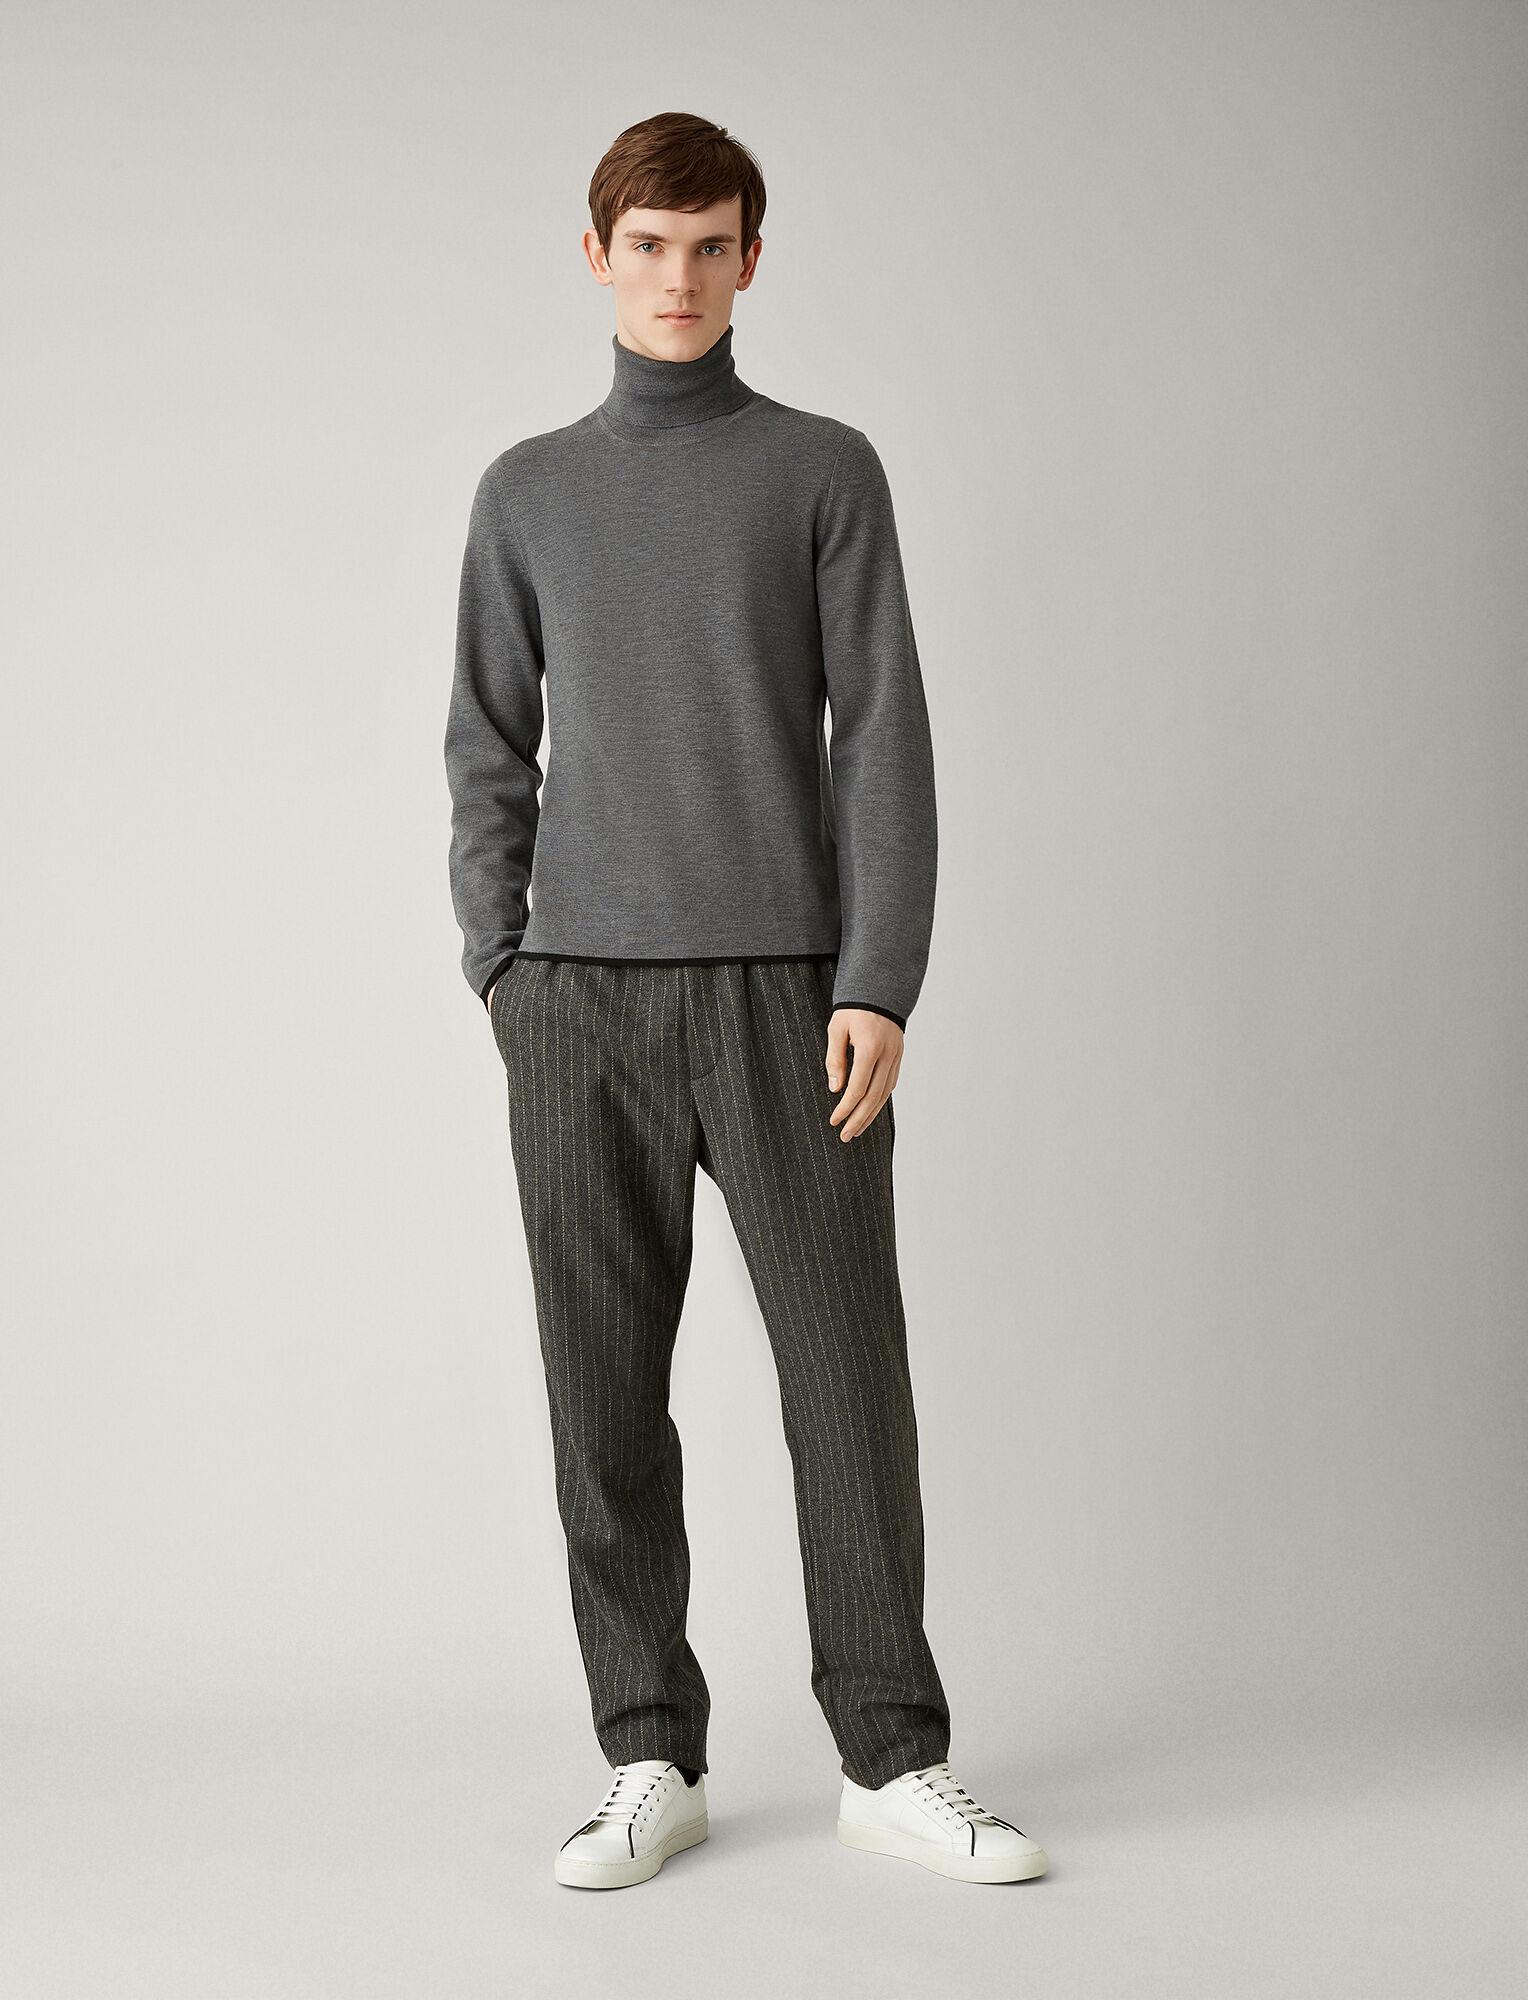 Joseph, Roll Neck Fine Milano Knit, in CHARCOAL